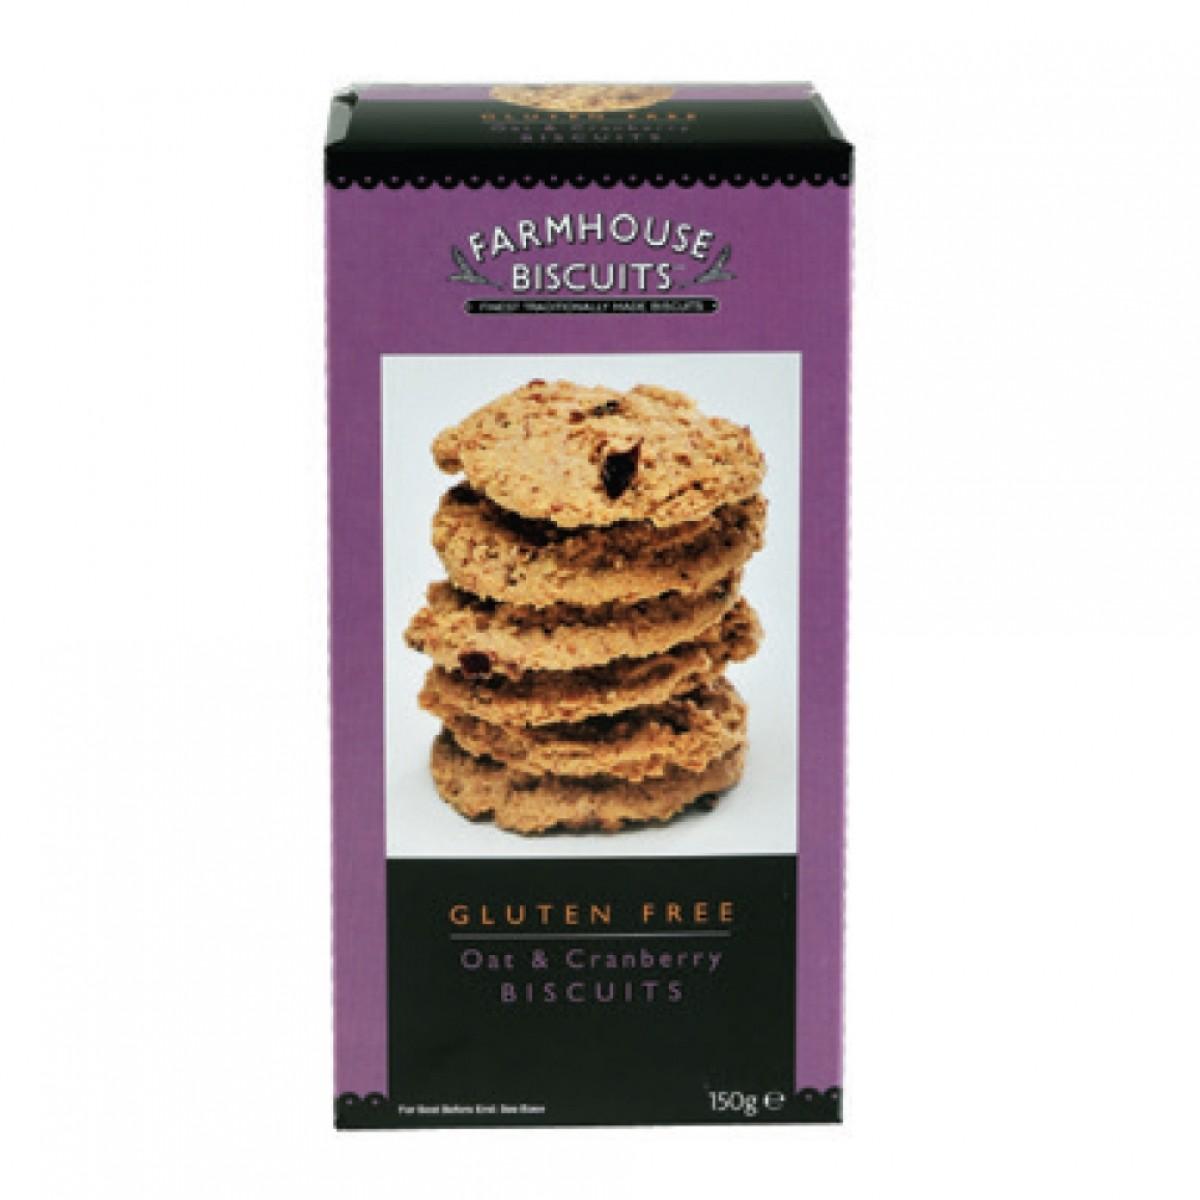 Oat Cranberry Biscuits